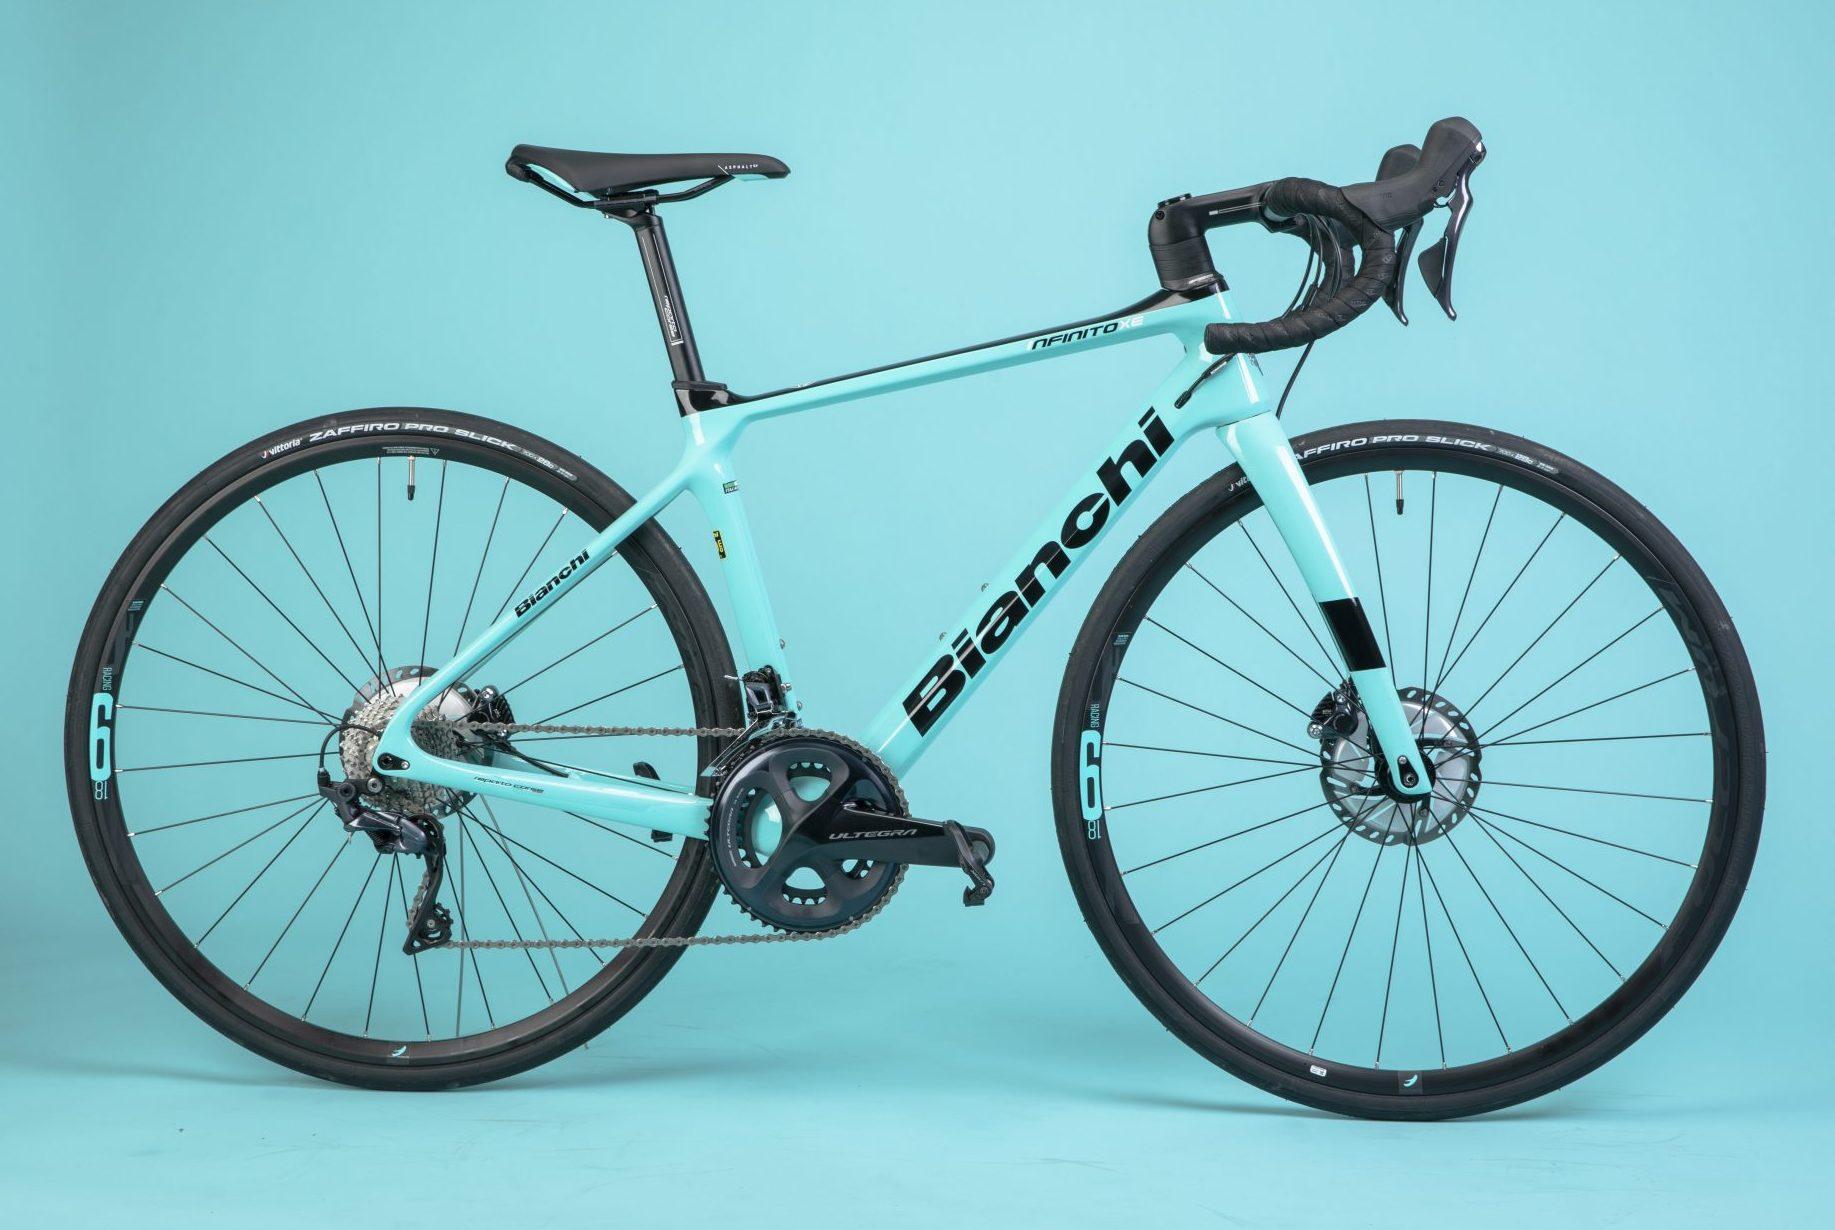 BIANCHI Infinito XE - dostupná endurance novinka v sezóne 2020